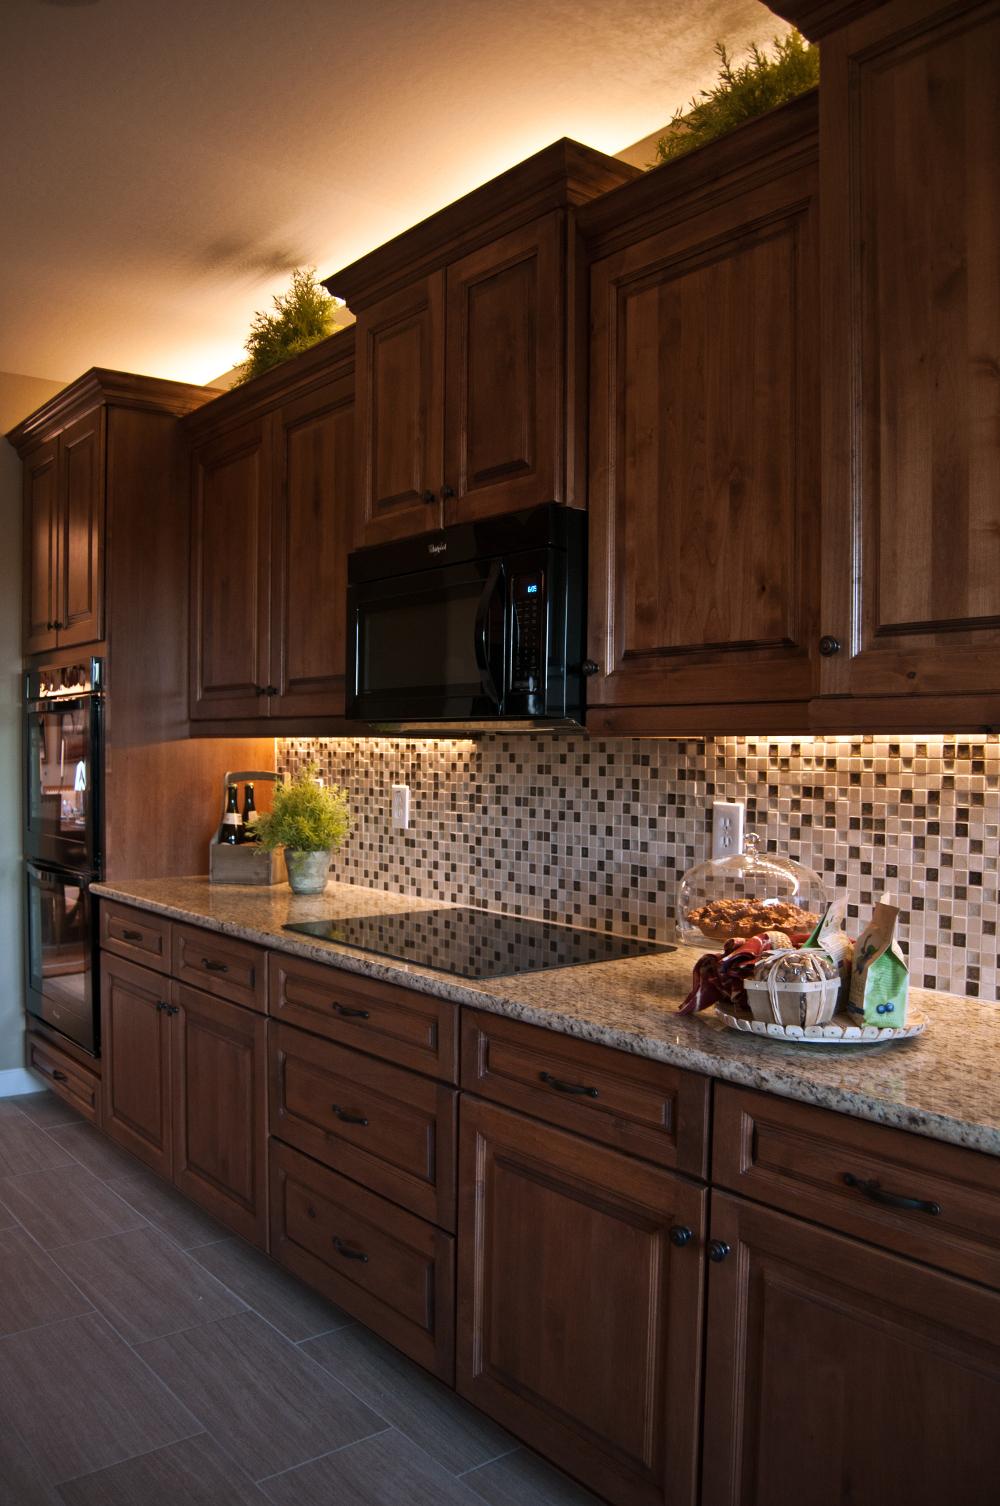 kitchen cabinets lighting ideas photo - 2